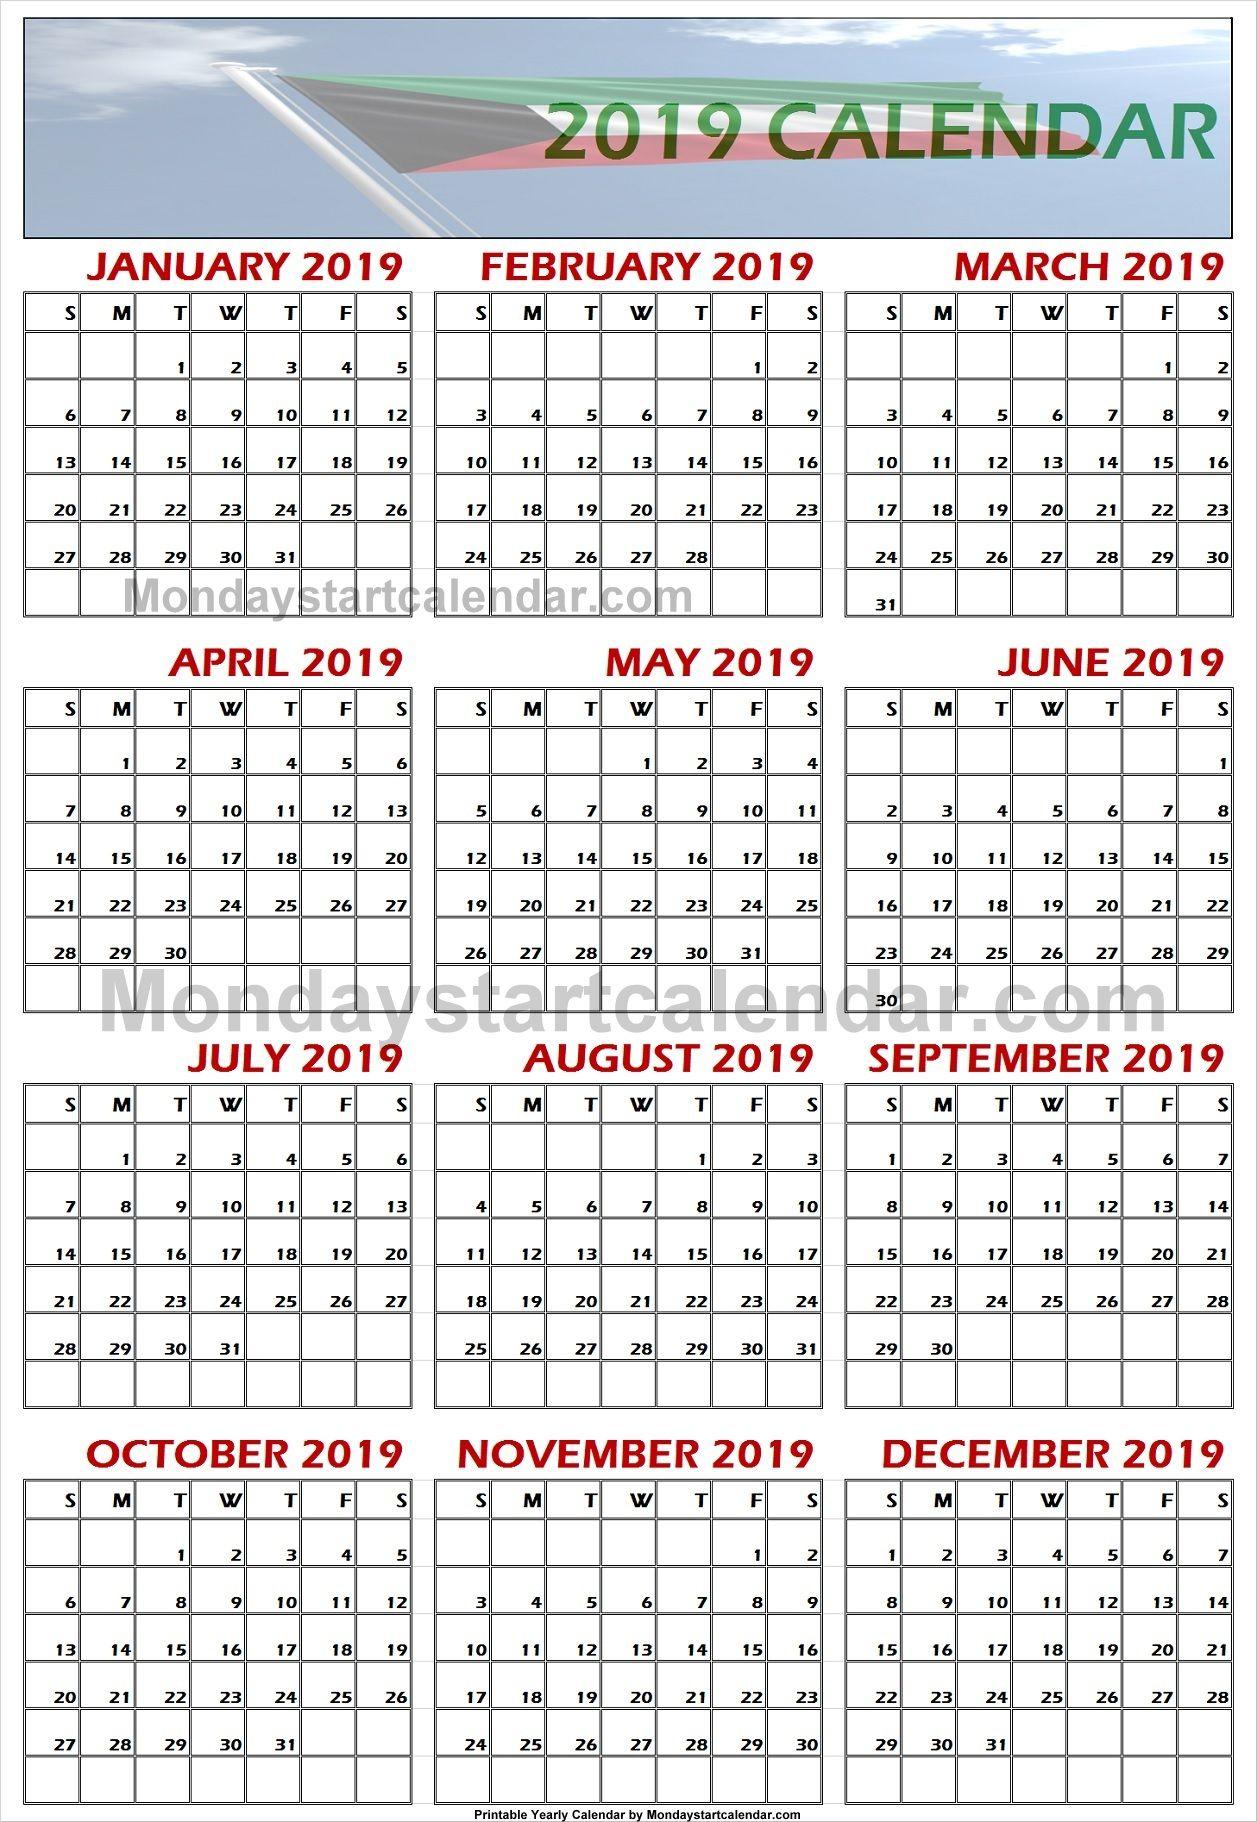 2019 Kuwait Calendar | School Holiday Calendar, Holiday